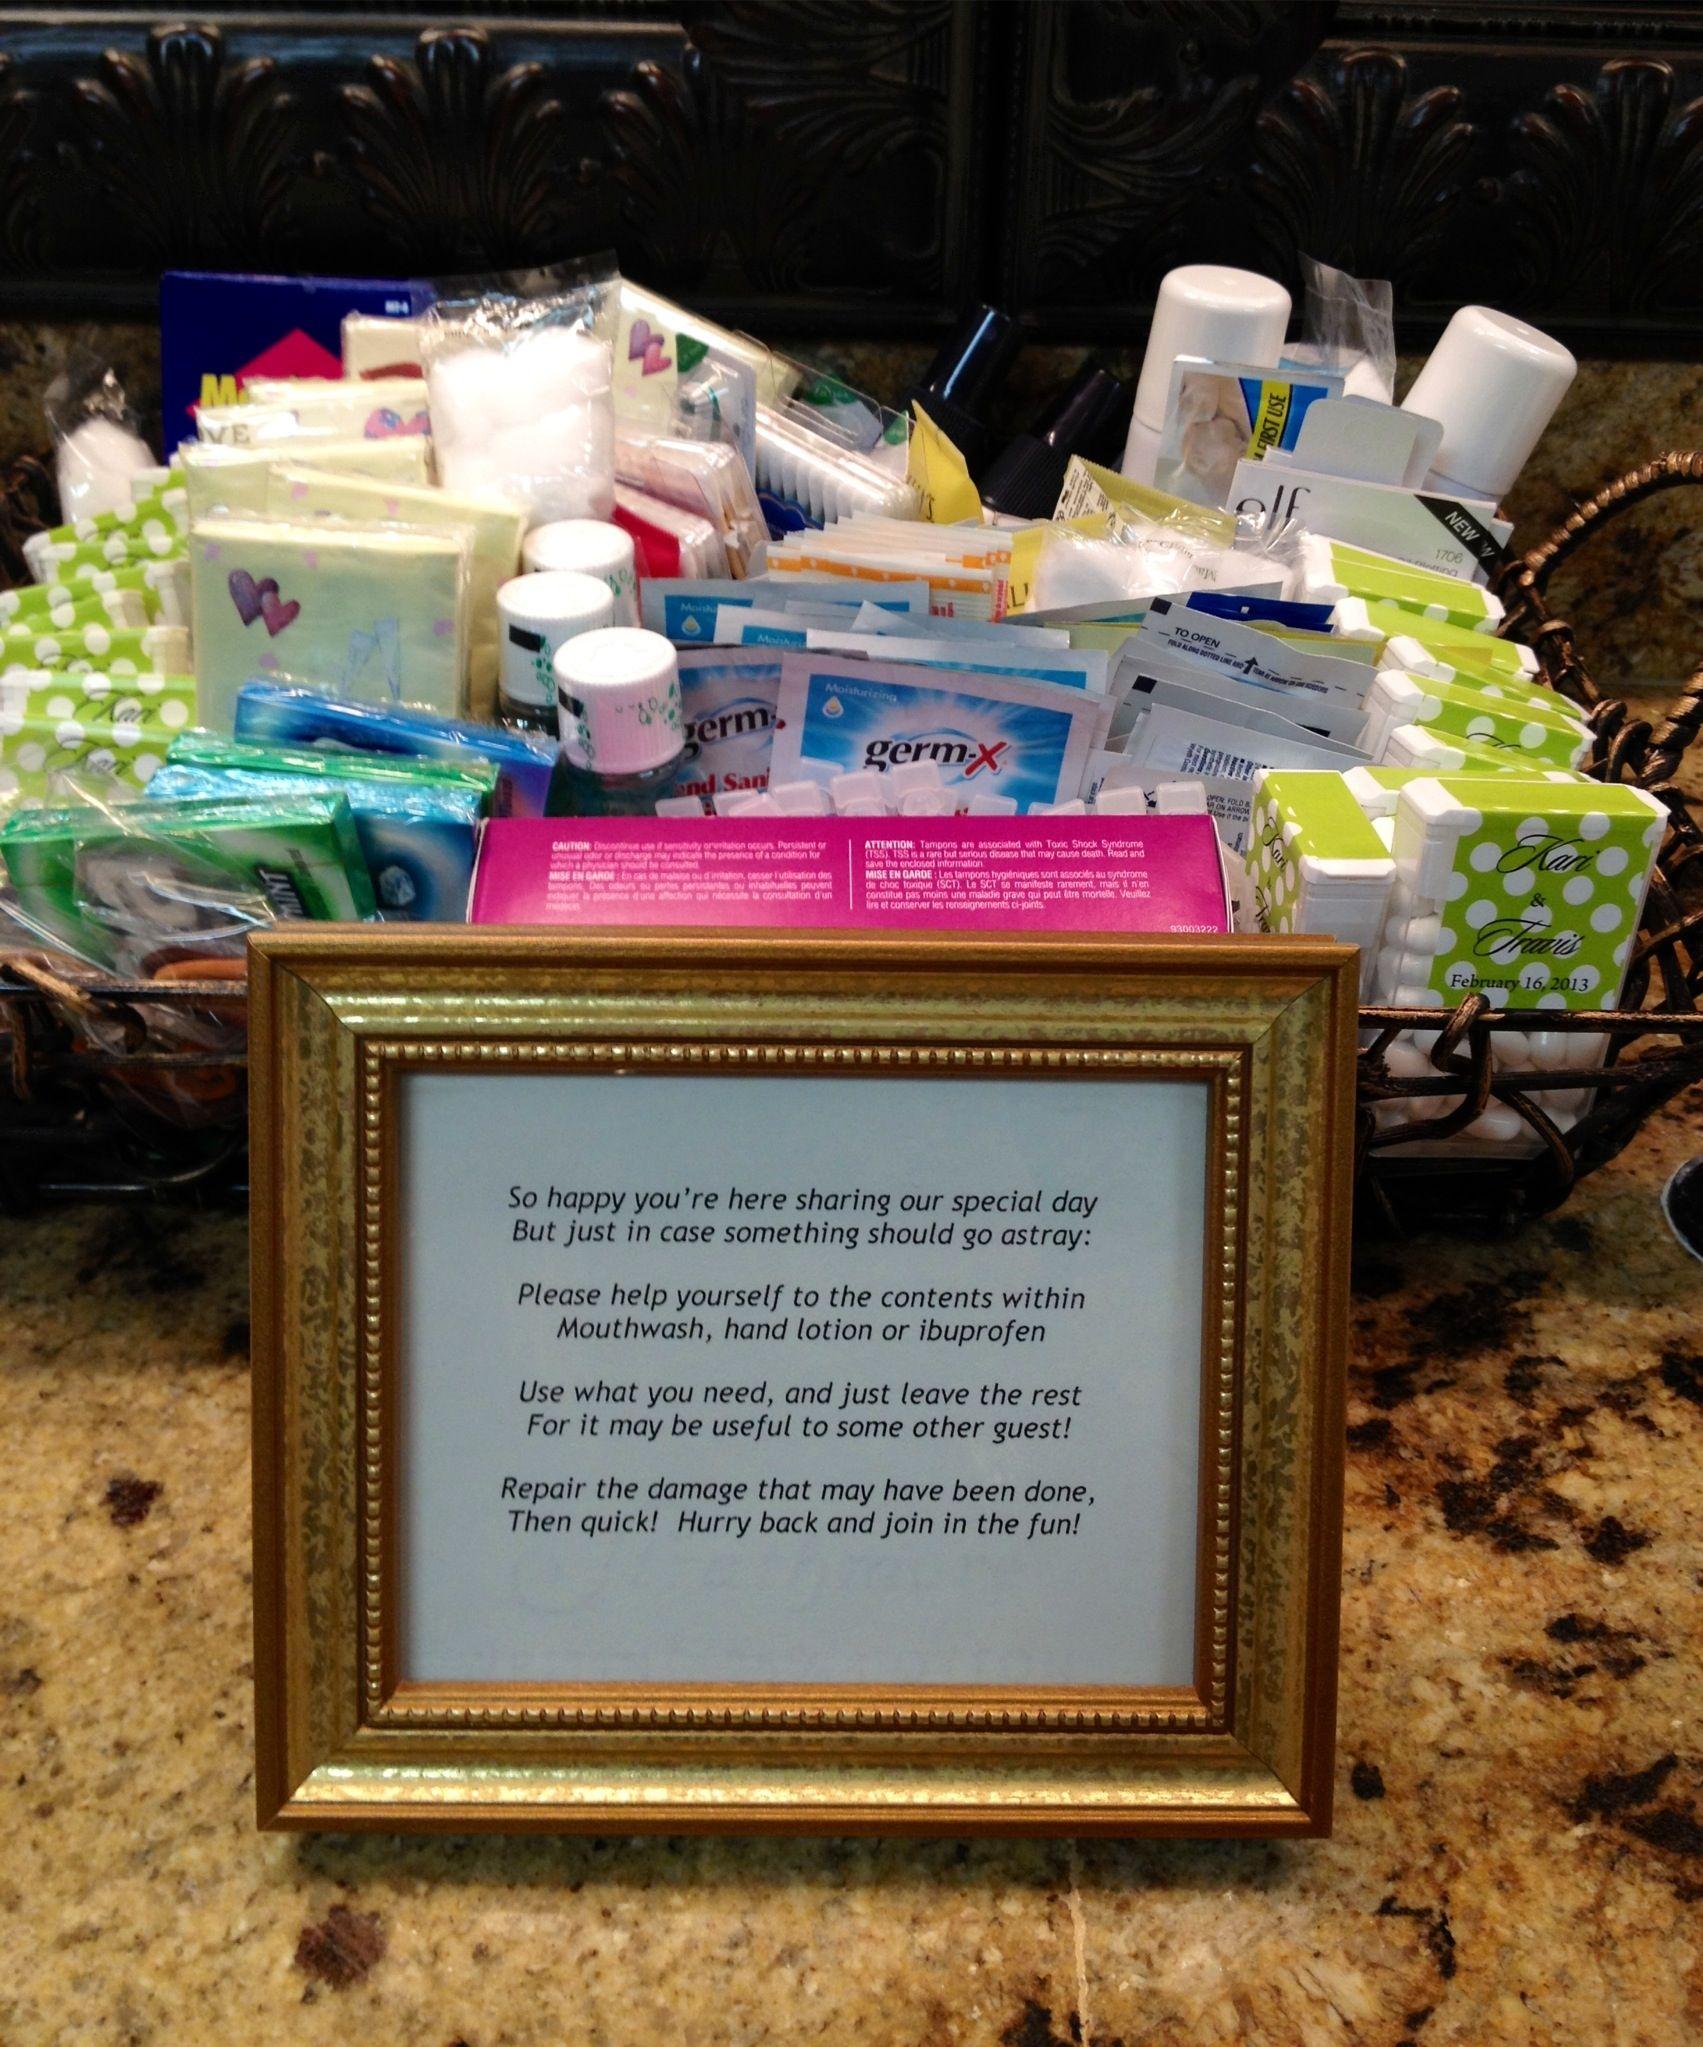 wedding bathroom baskets ideas - include travel size mouthwash ...